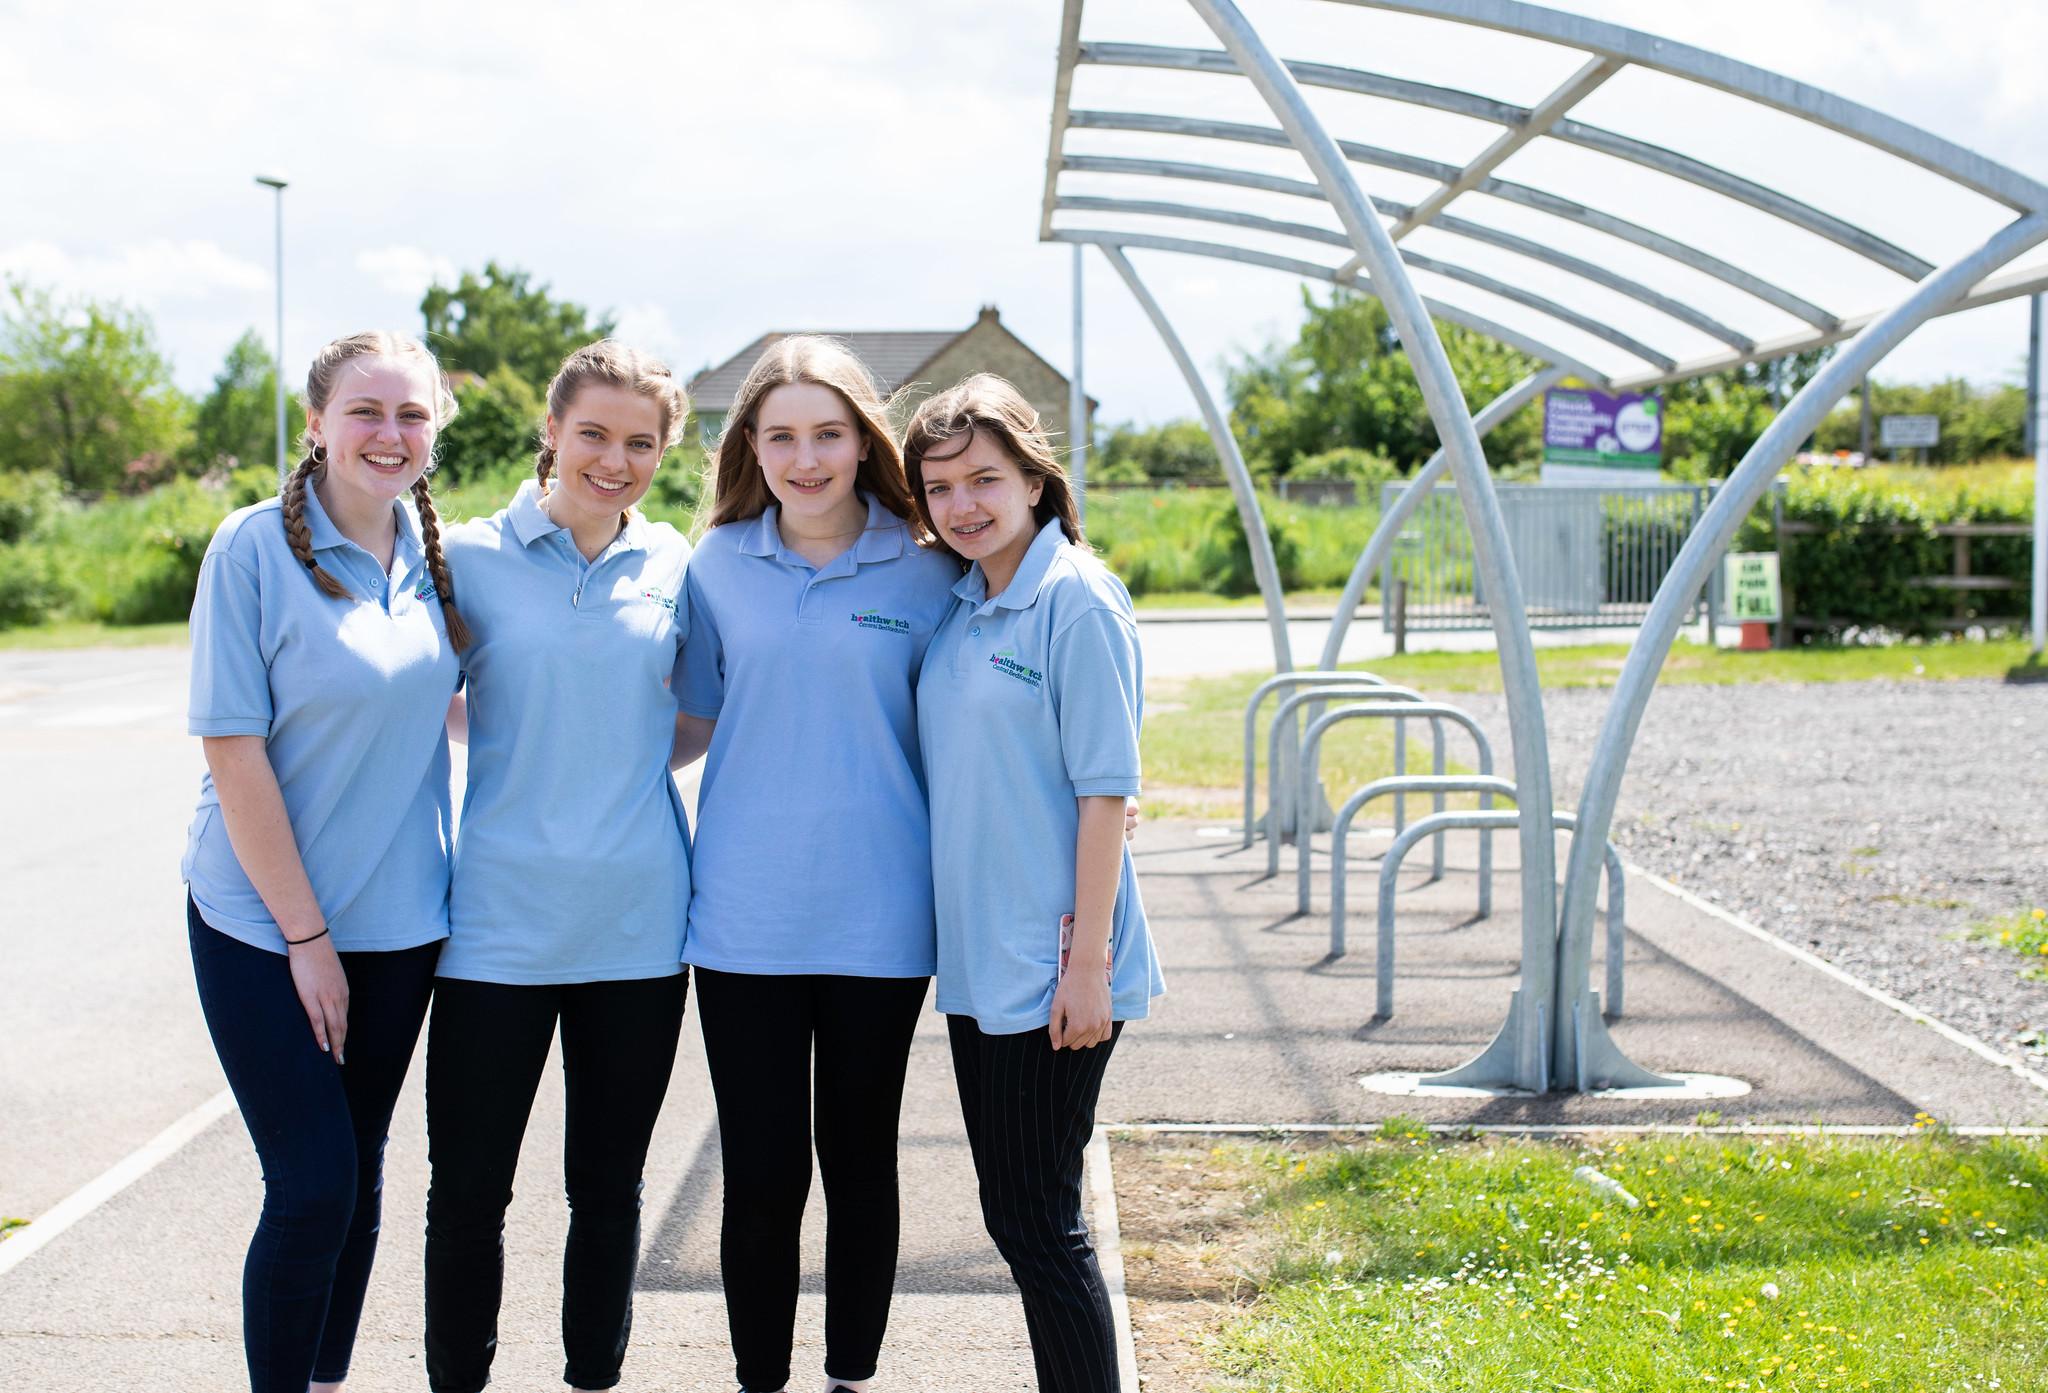 Four young girls wearing Healthwatch tshirts